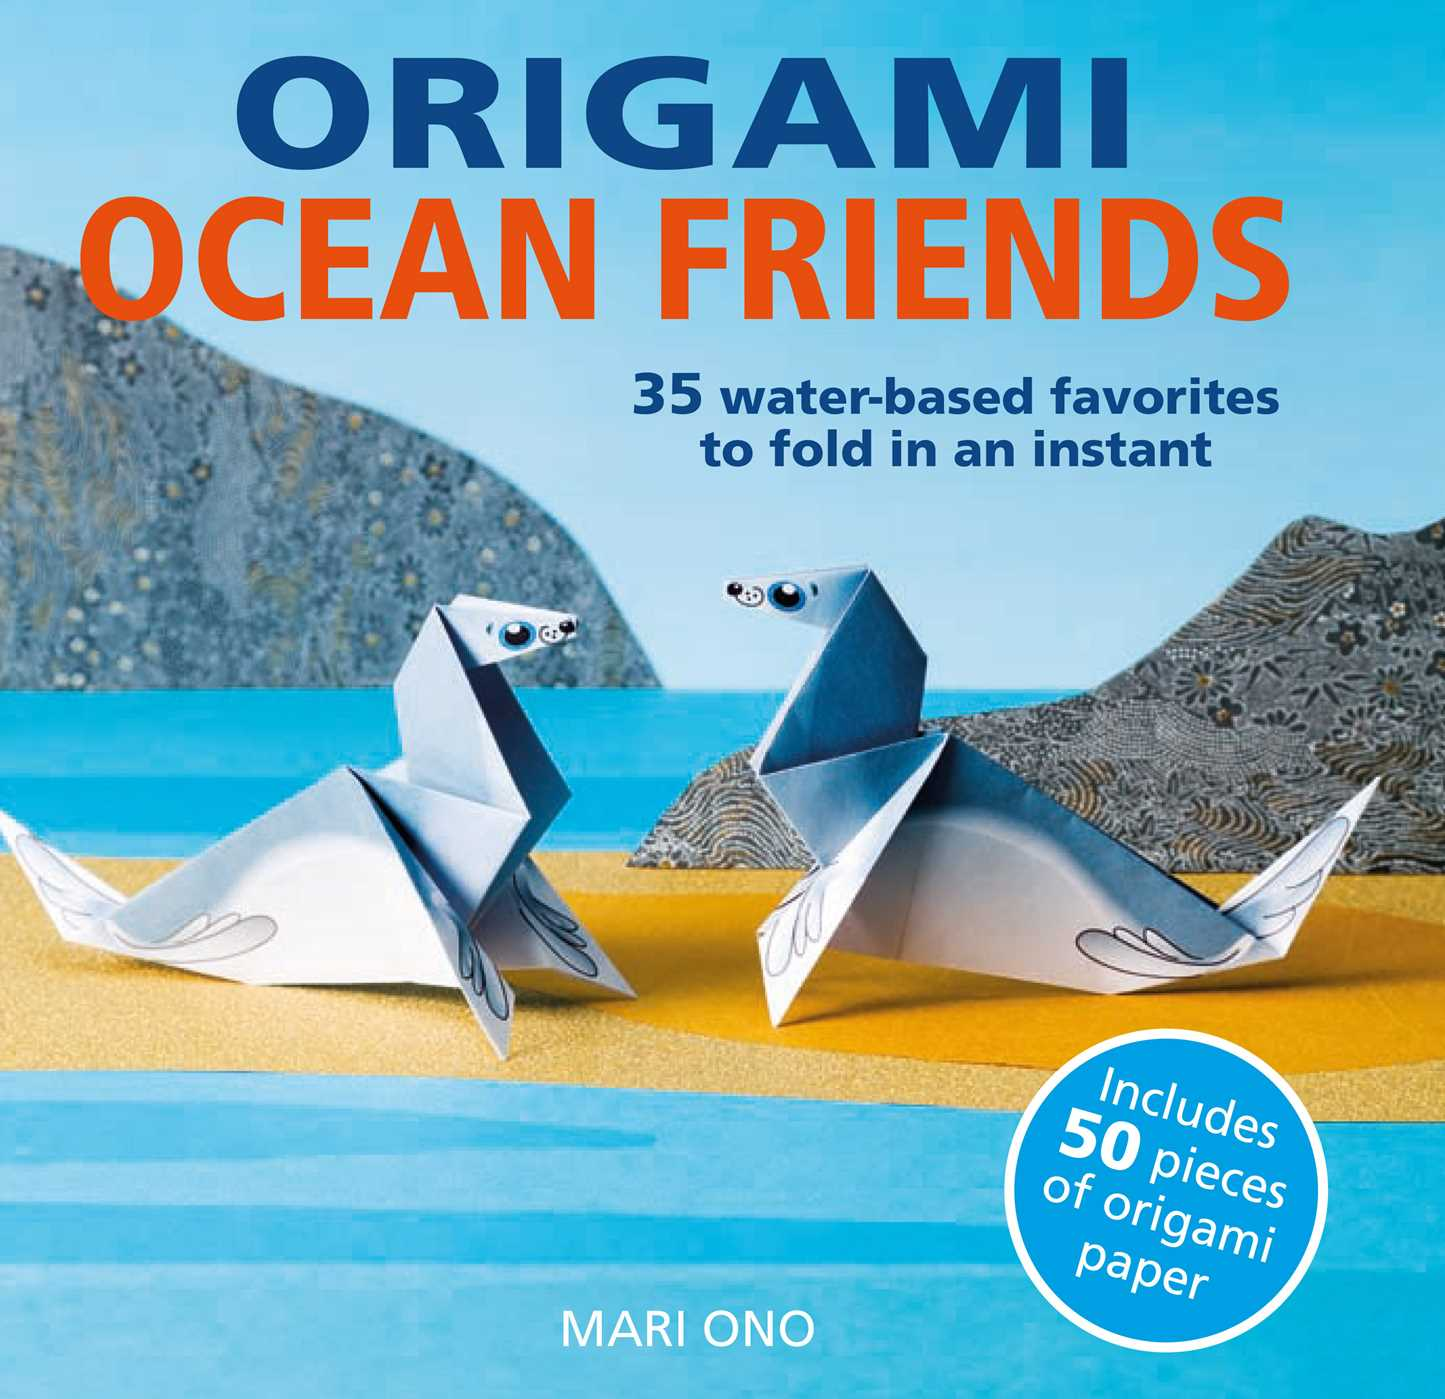 Origami ocean friends 9781782496373 hr